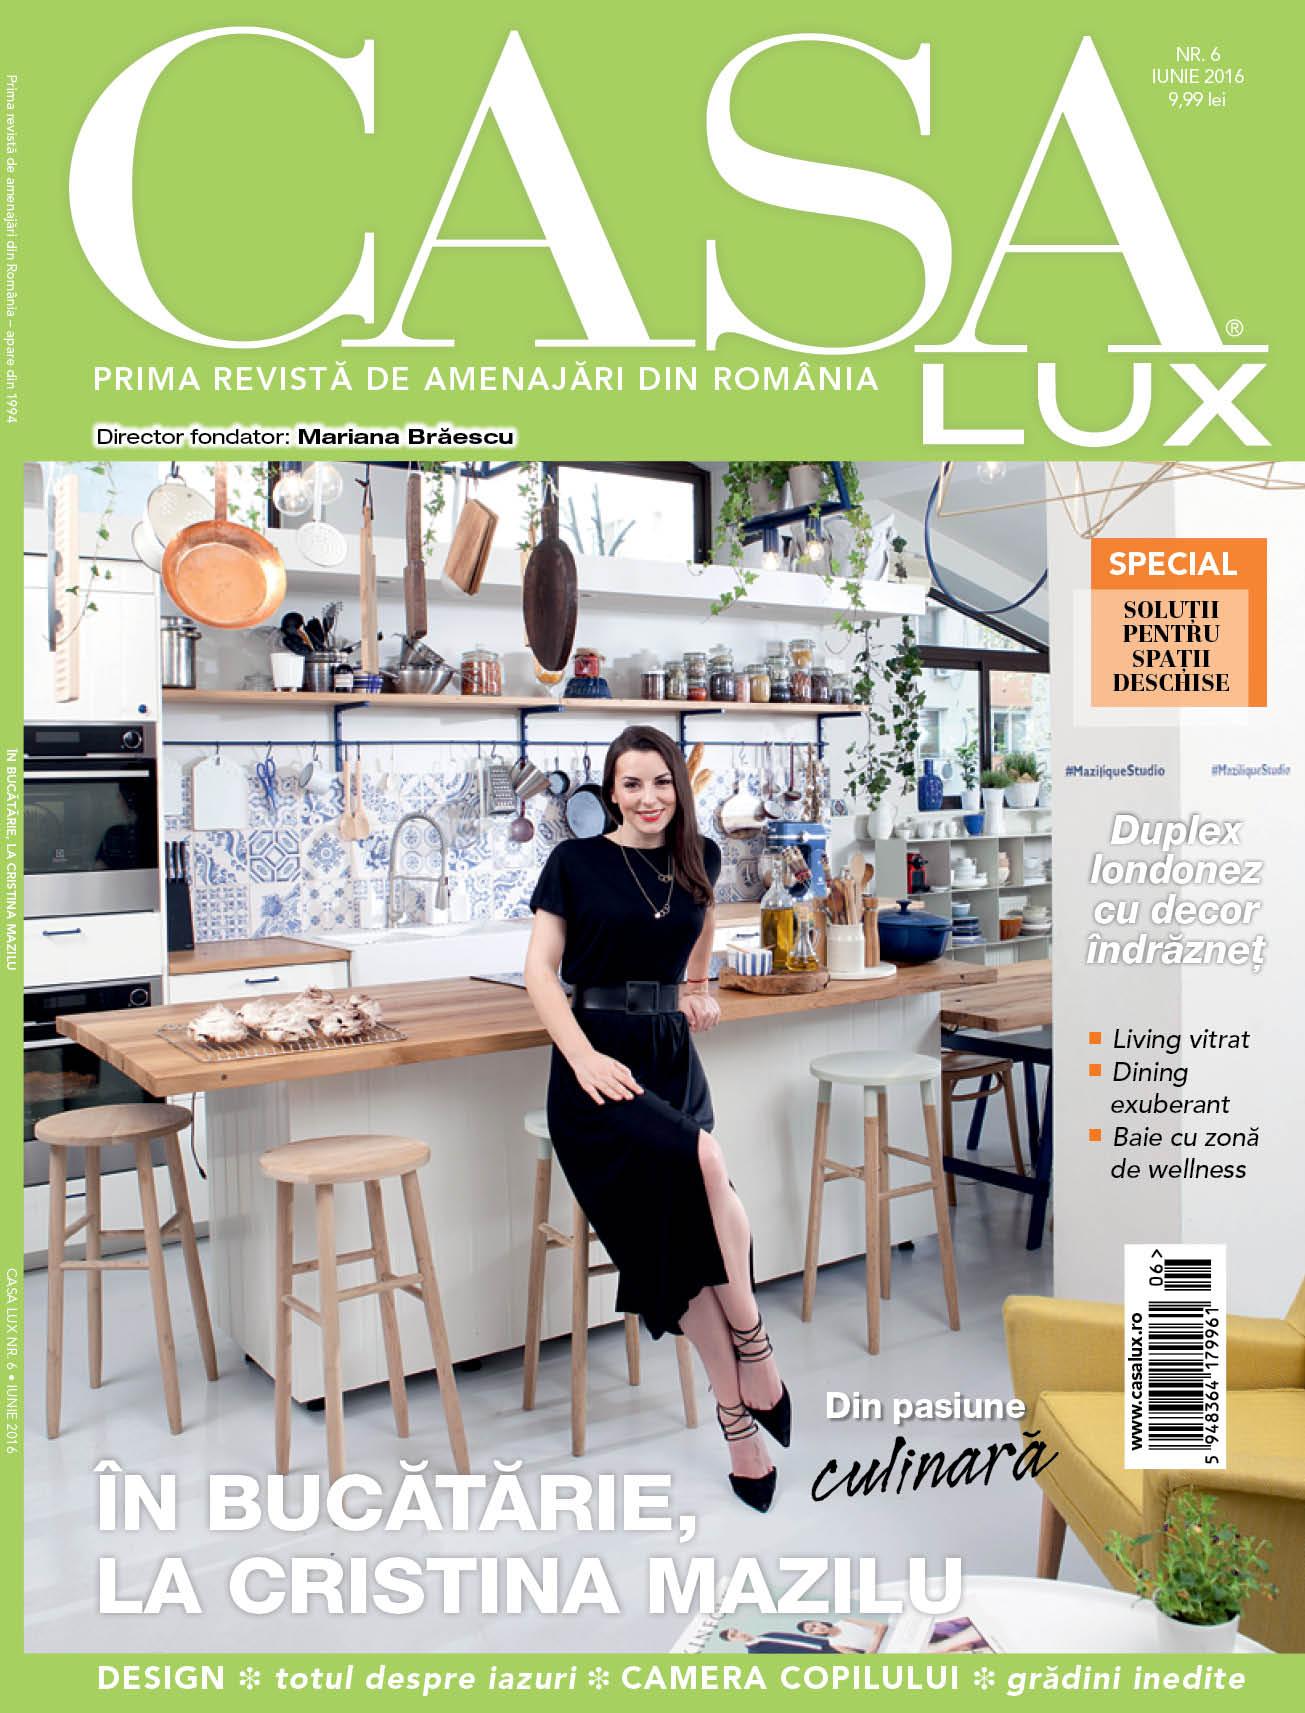 Casa lux, ediția iunie 2016